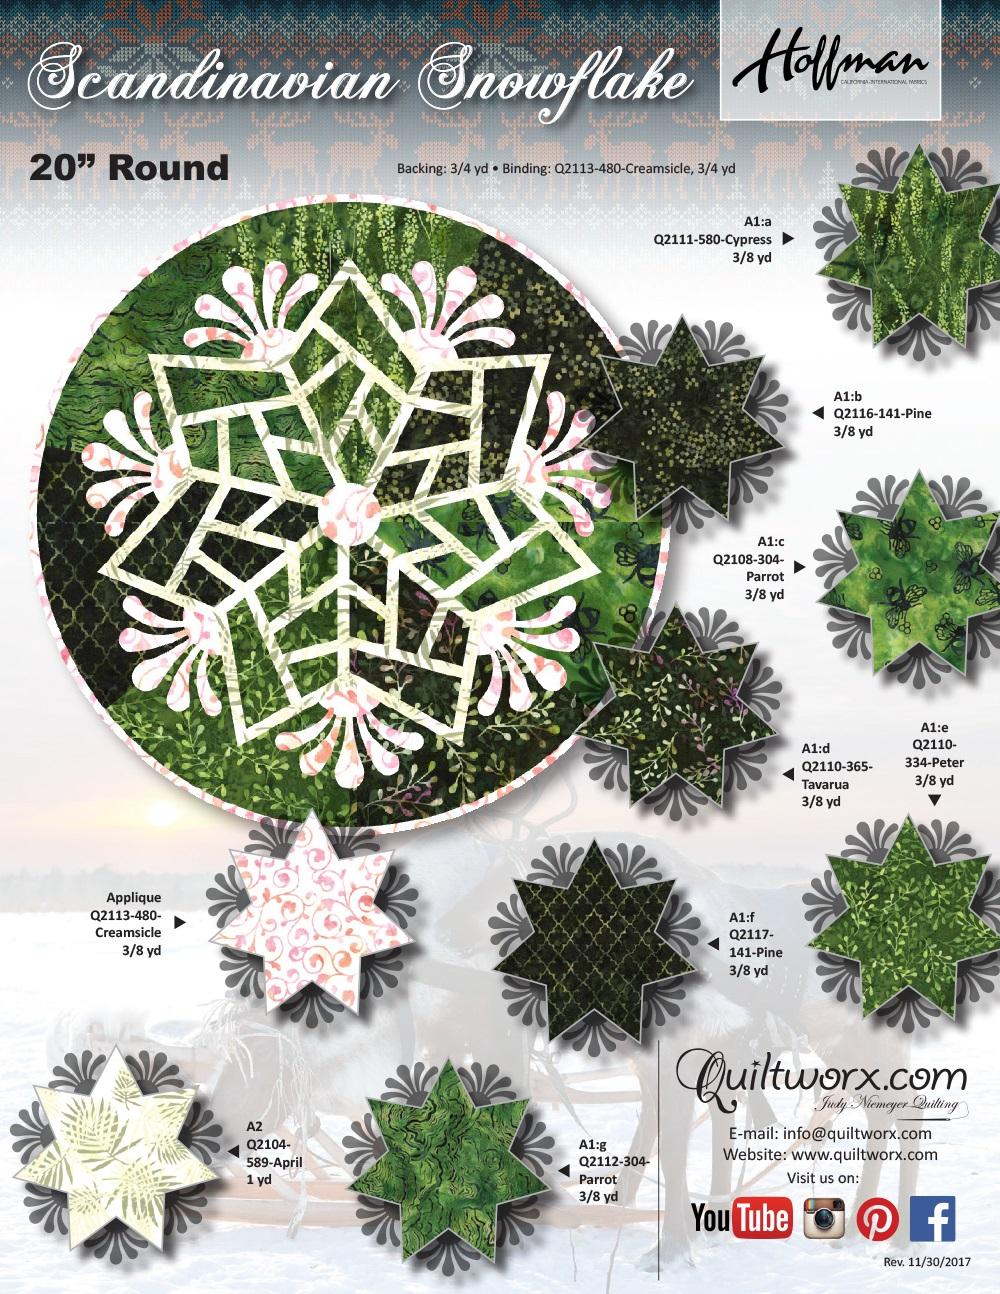 Scandinavian-Snowflake-(Green)-Hoffman-KS-1 - Copy